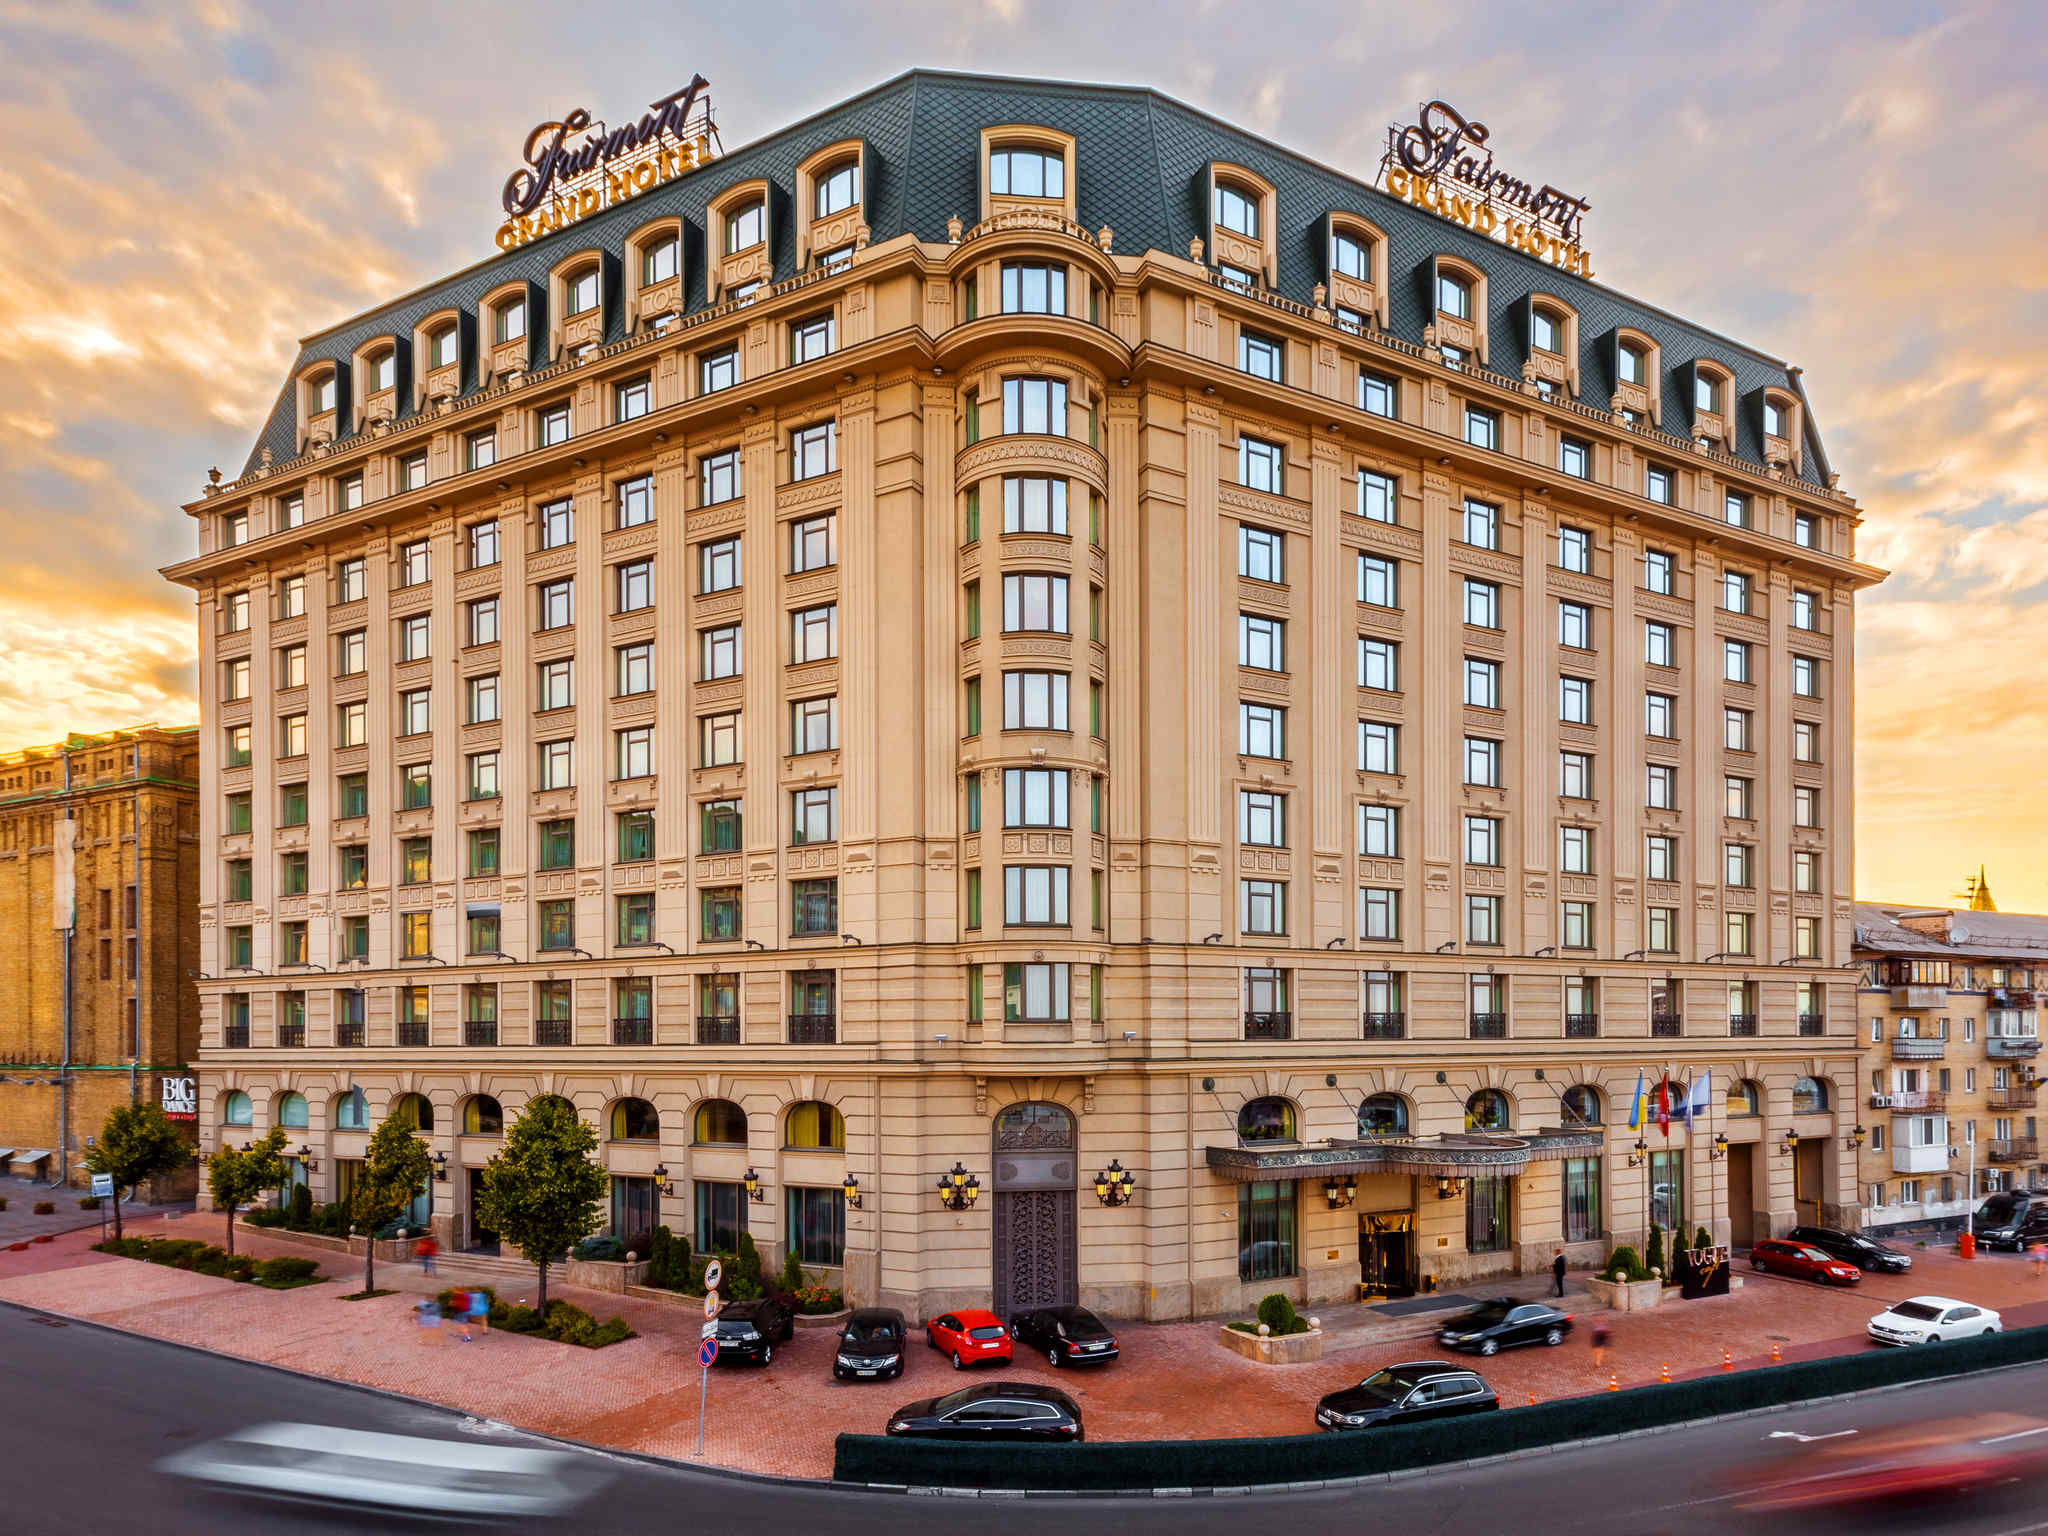 Hotell – Fairmont Grand Hotel - Kyiv